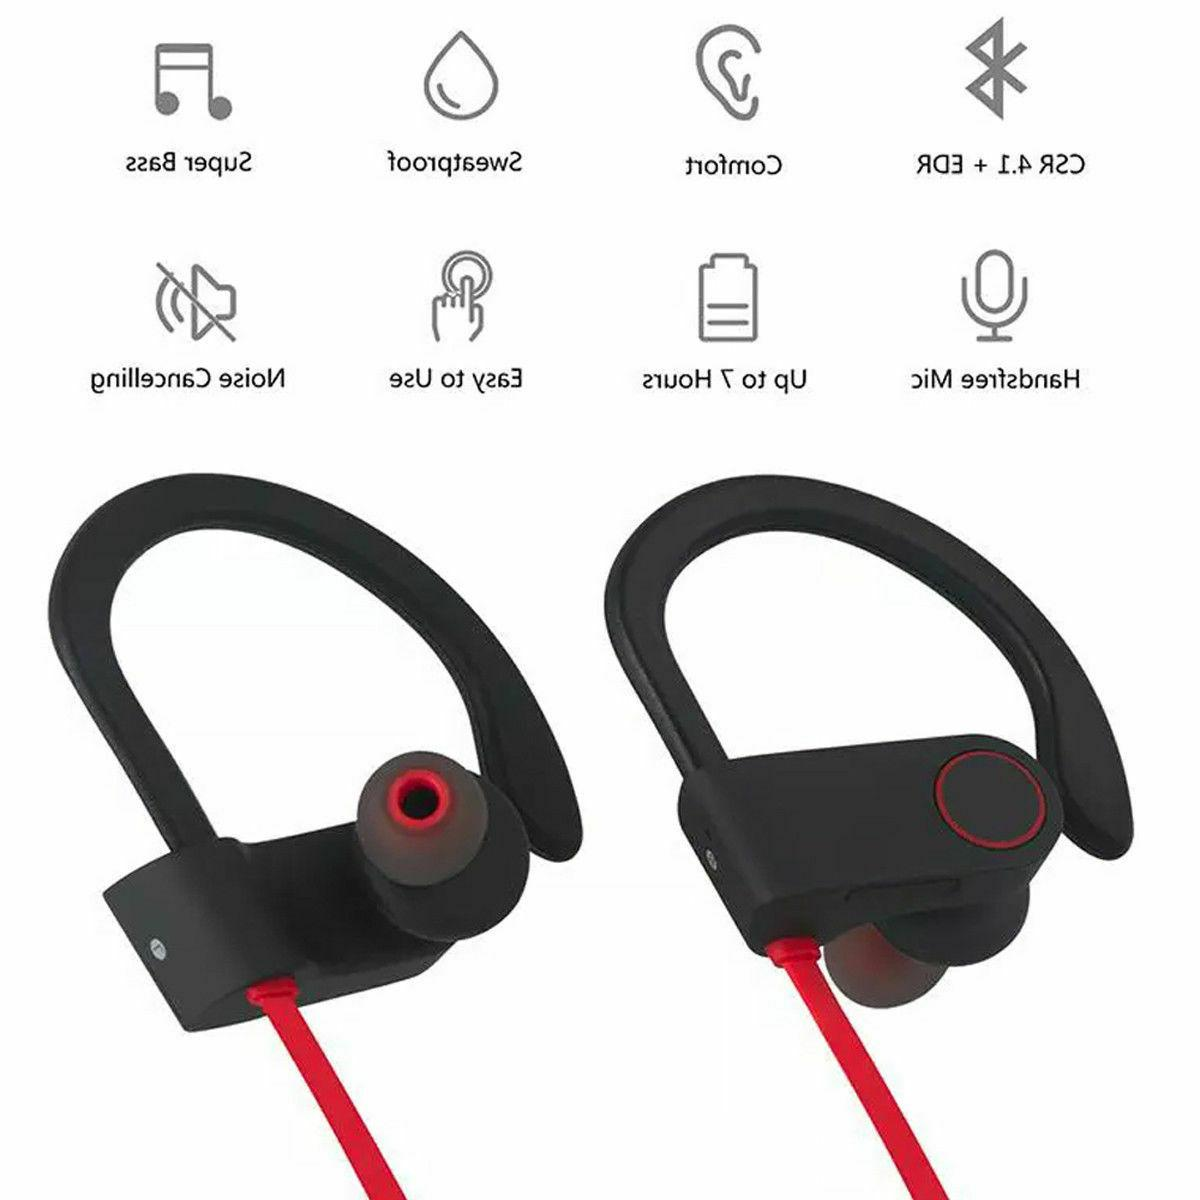 Sweatproof Earphones In Ear Headphones Earbuds Headset